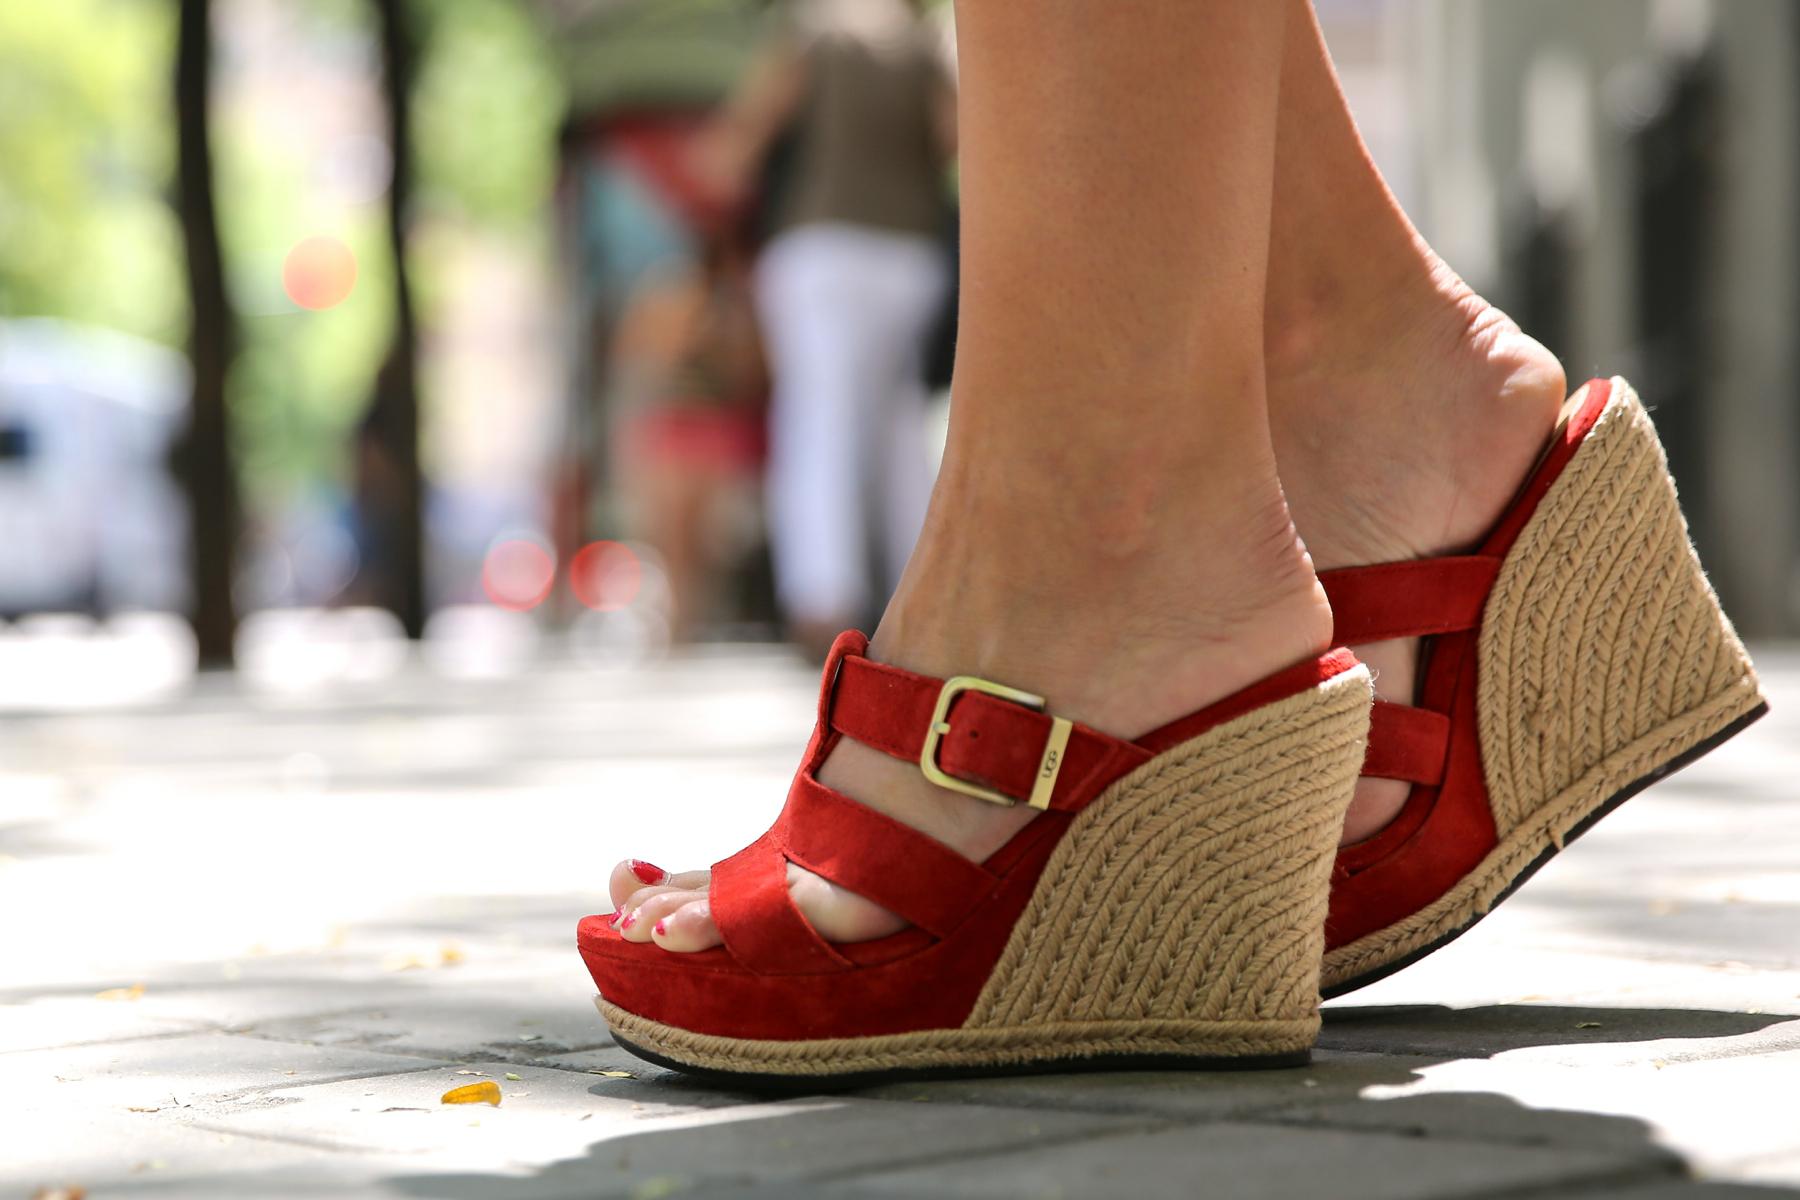 trendy_taste-look-outfit-street_style-ootd-blog-blogger-fashion_spain-moda_españa-ugg_australia-clutch_etnico-vestido_negro-black_dress-brandy_melville-1